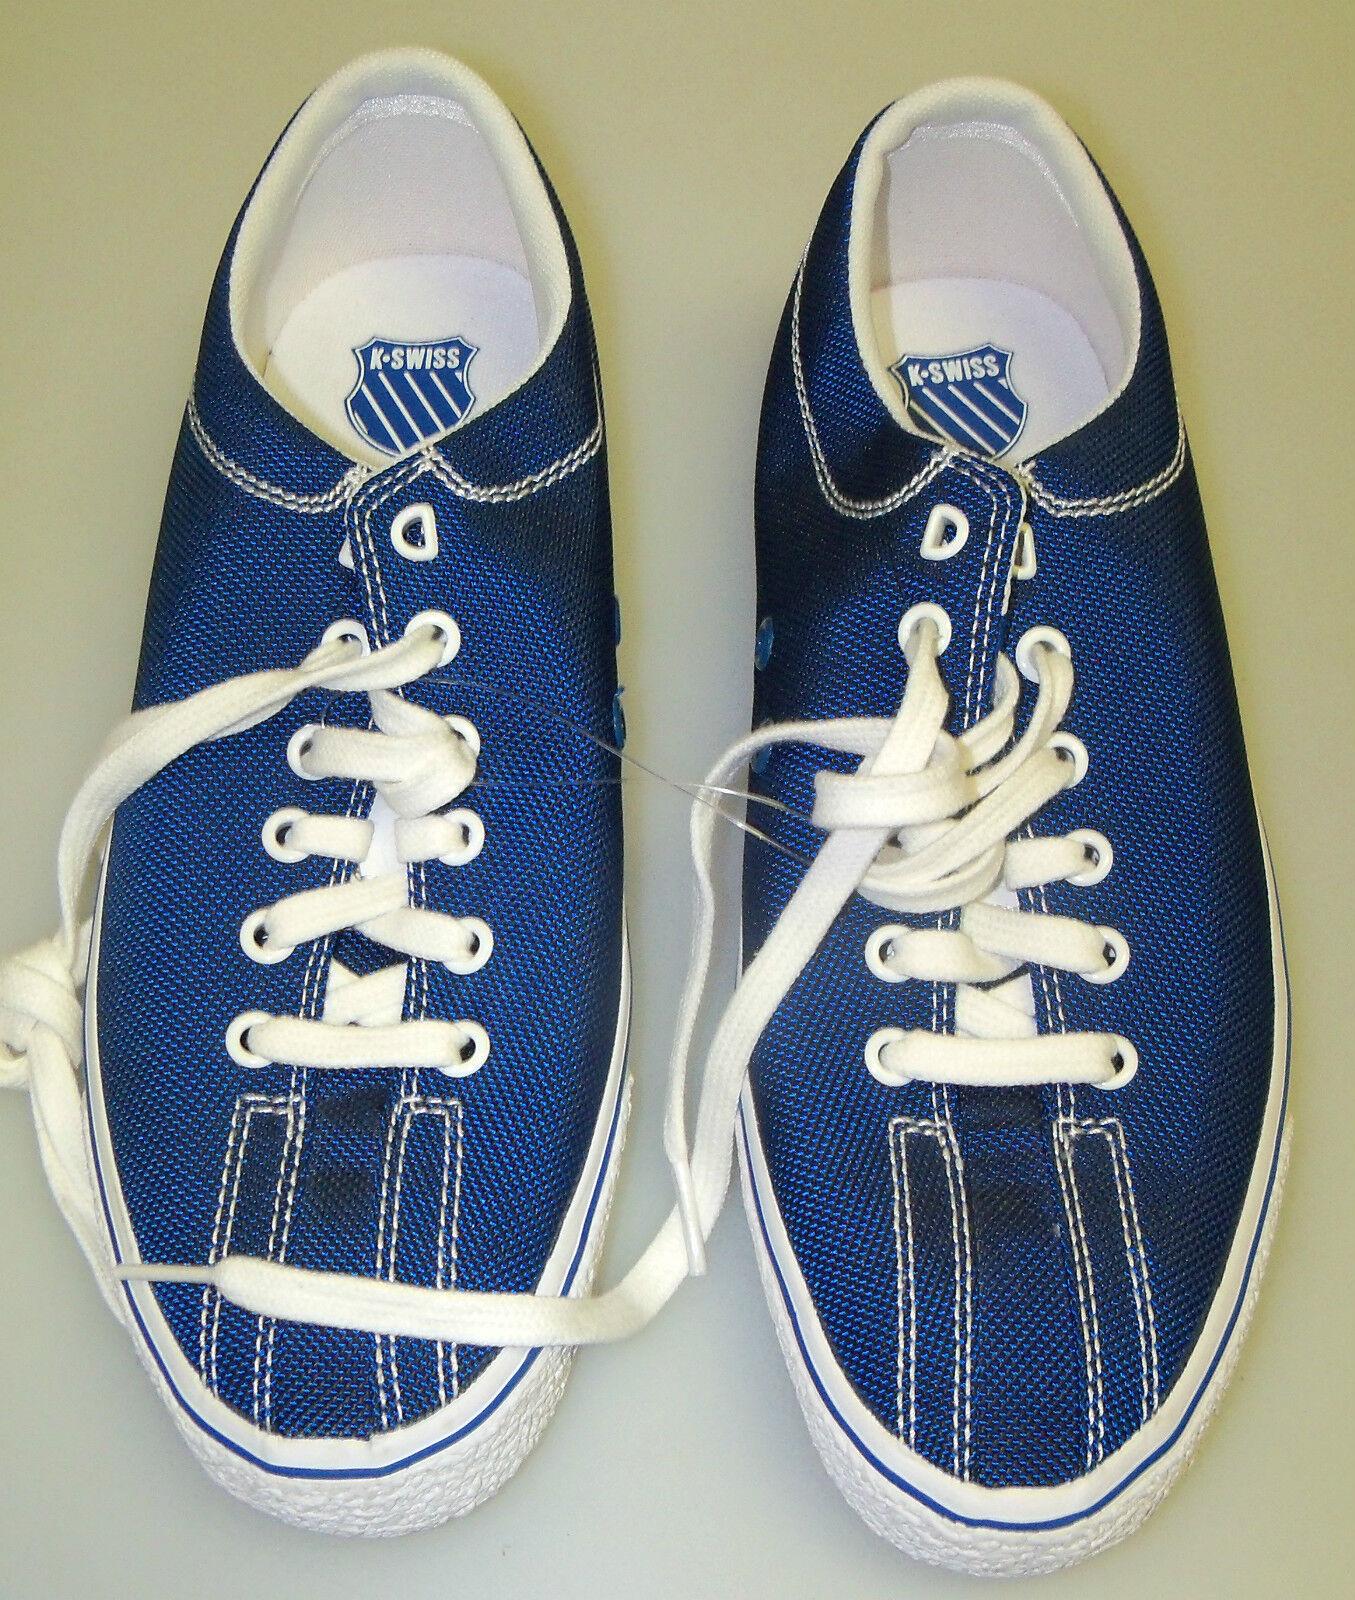 K-Swiss Gr. UK 8 Herren NWOB Blau Mode Turnschuhe - NWOB Herren - Bx = SHO-12 e266b8